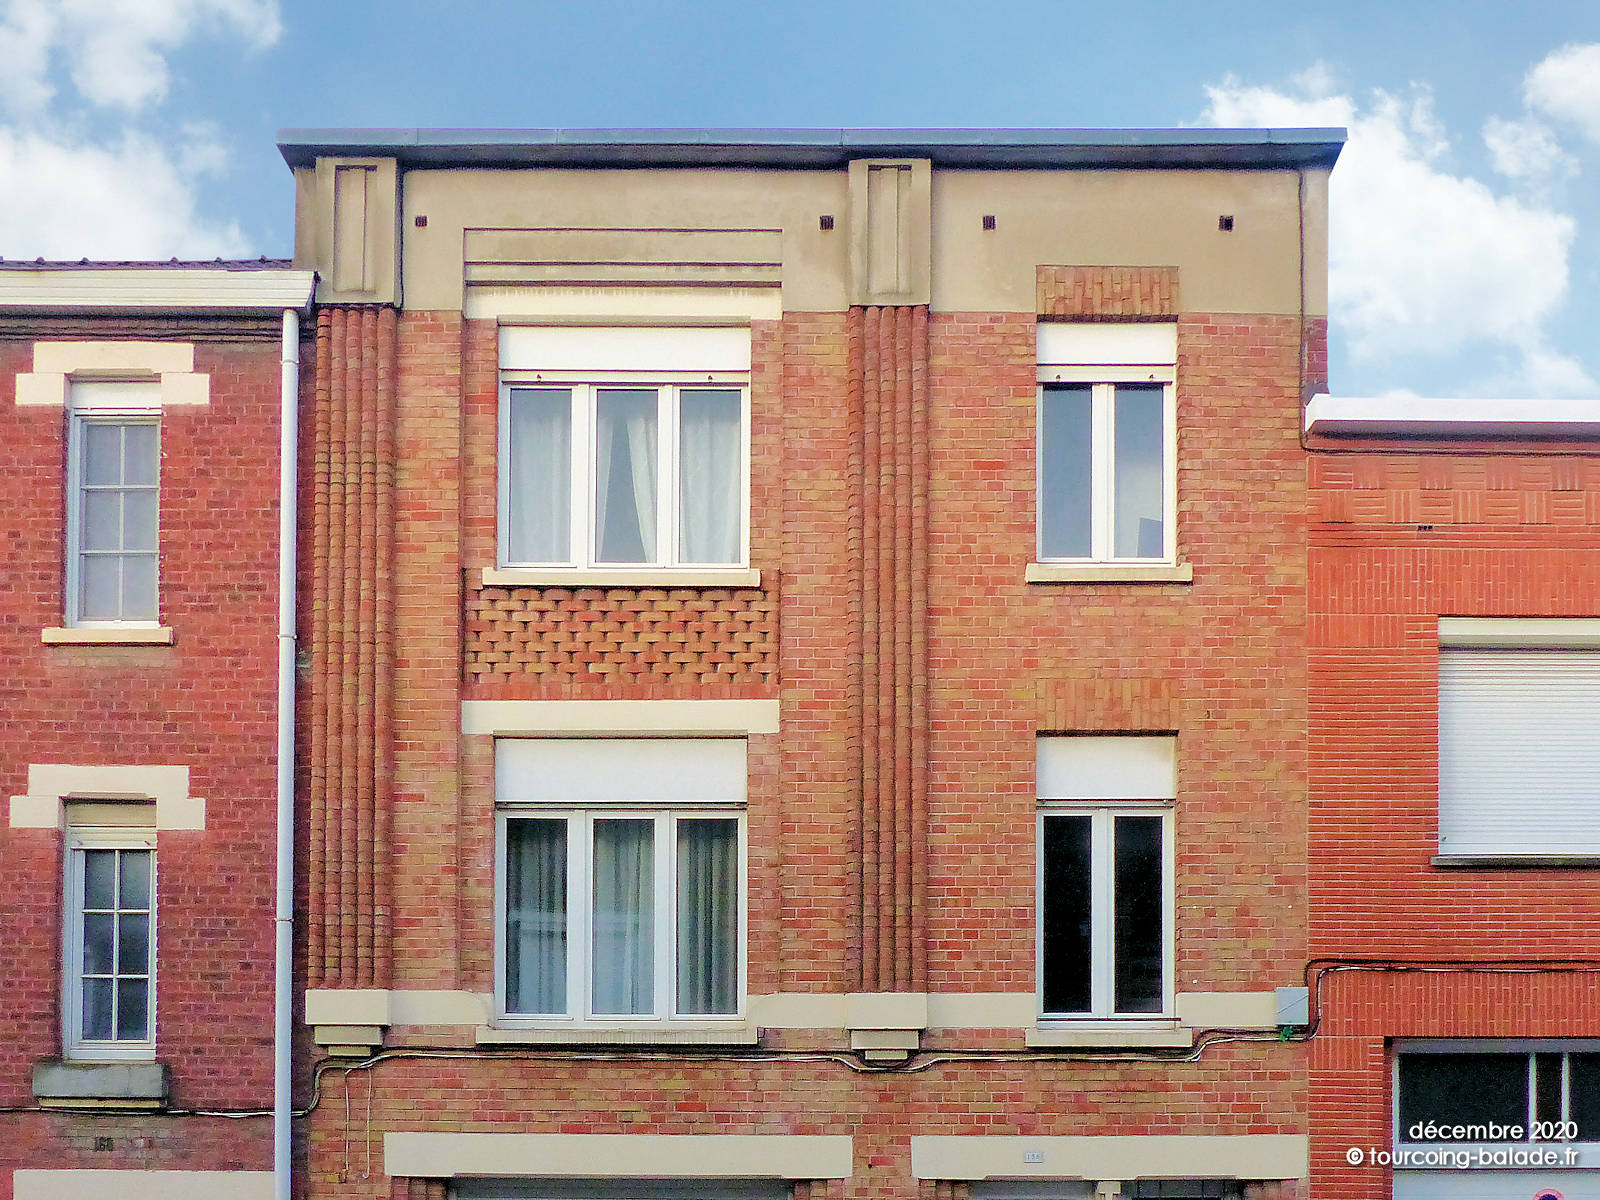 Architecture Moderne Années 30, Tourcoing Blanc Seau